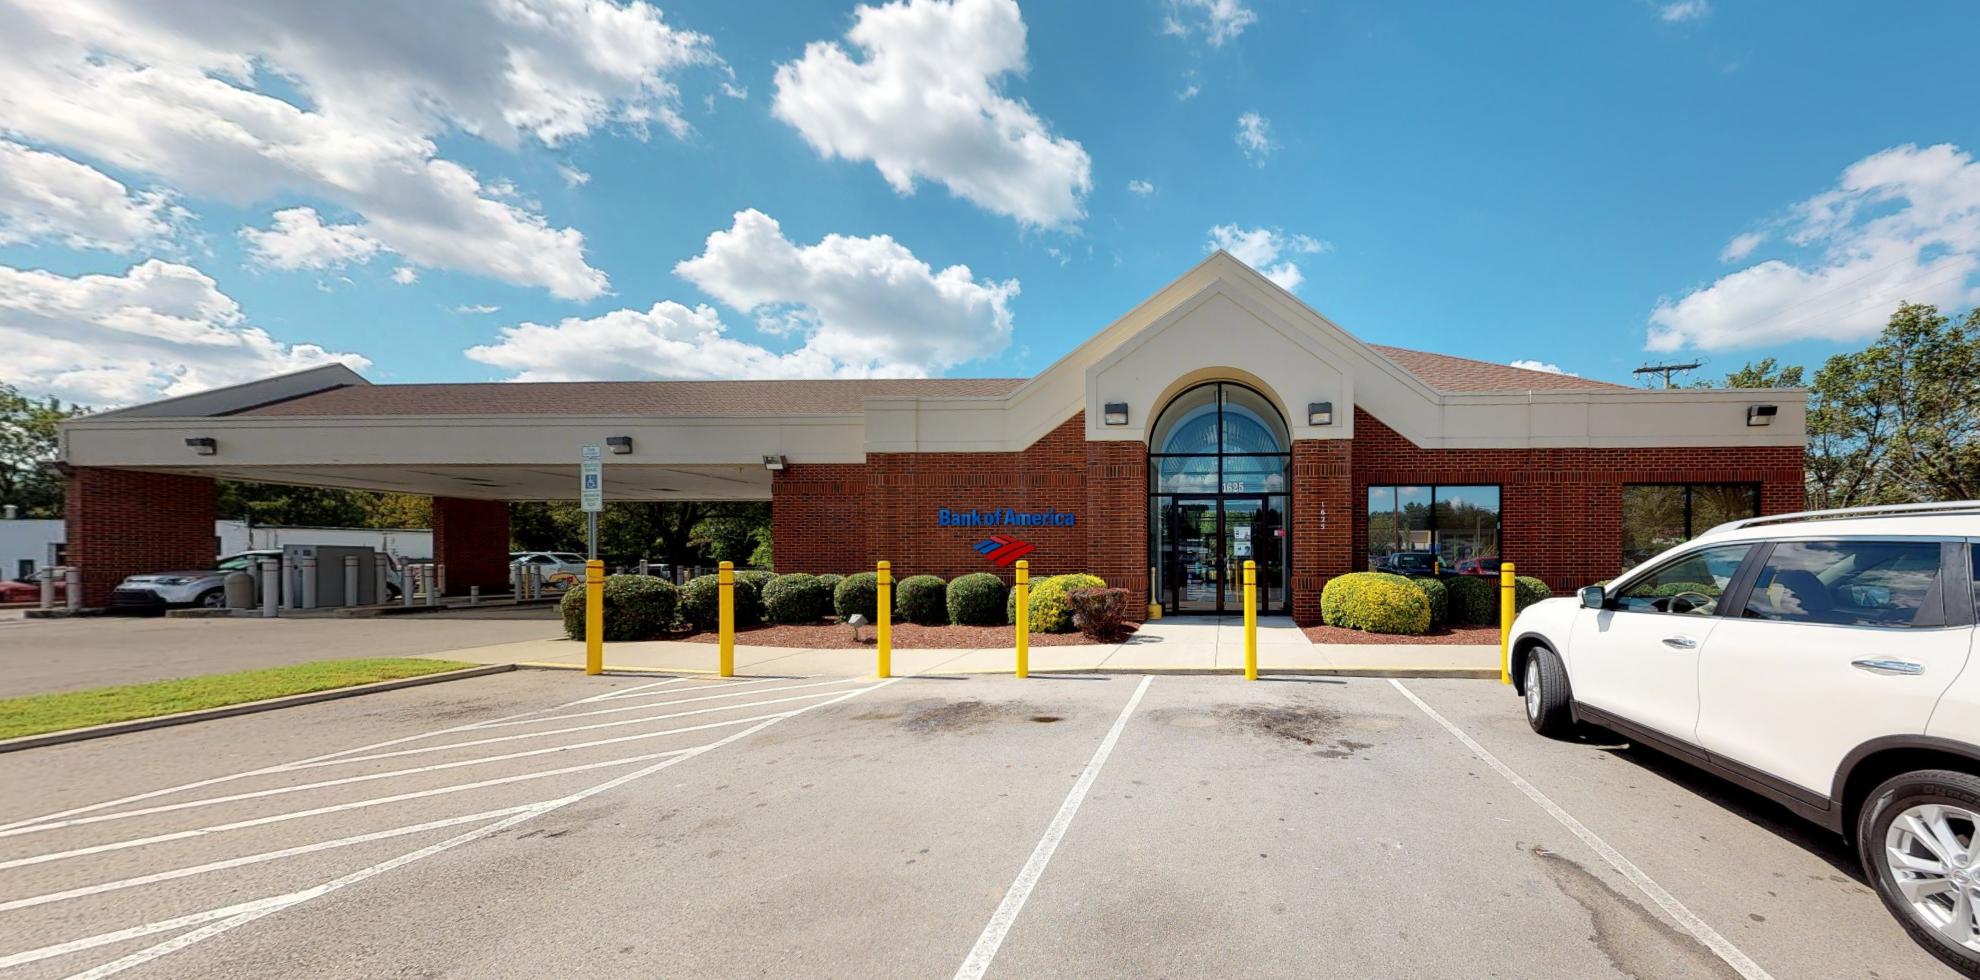 Bank of America financial center with drive-thru ATM | 1625 Memorial Blvd, Murfreesboro, TN 37129